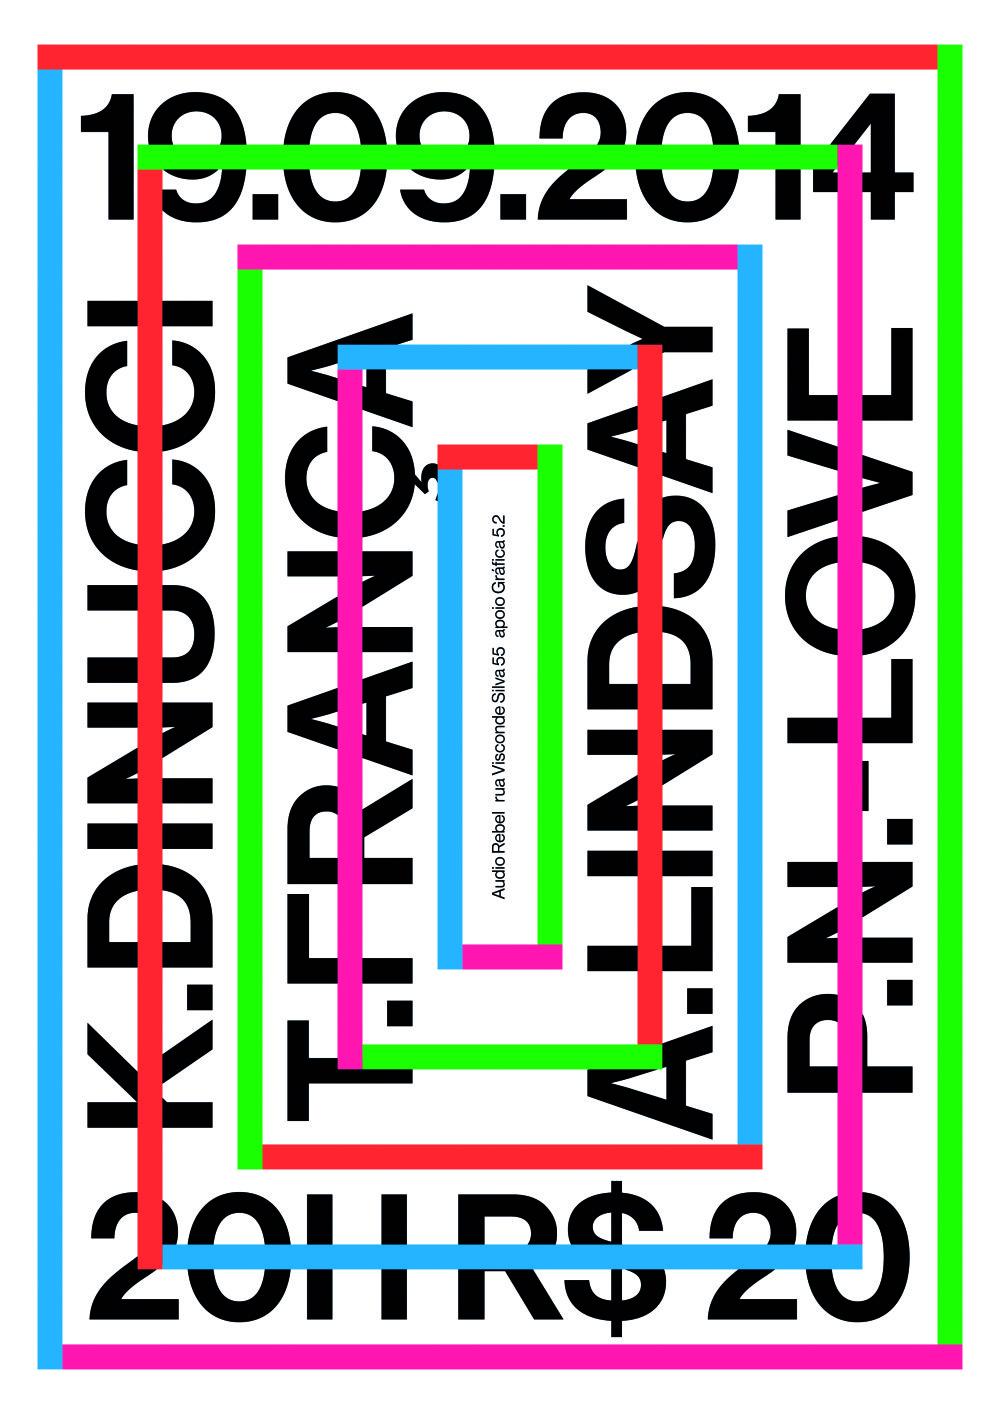 Cena primátora mesta Trnava / Trnava City Mayor's Prize Lacaz, Thiago (bra) Kiko Dinucci / Thiago França / Arto Lindsay / Paal Nilssen-Love, 2014